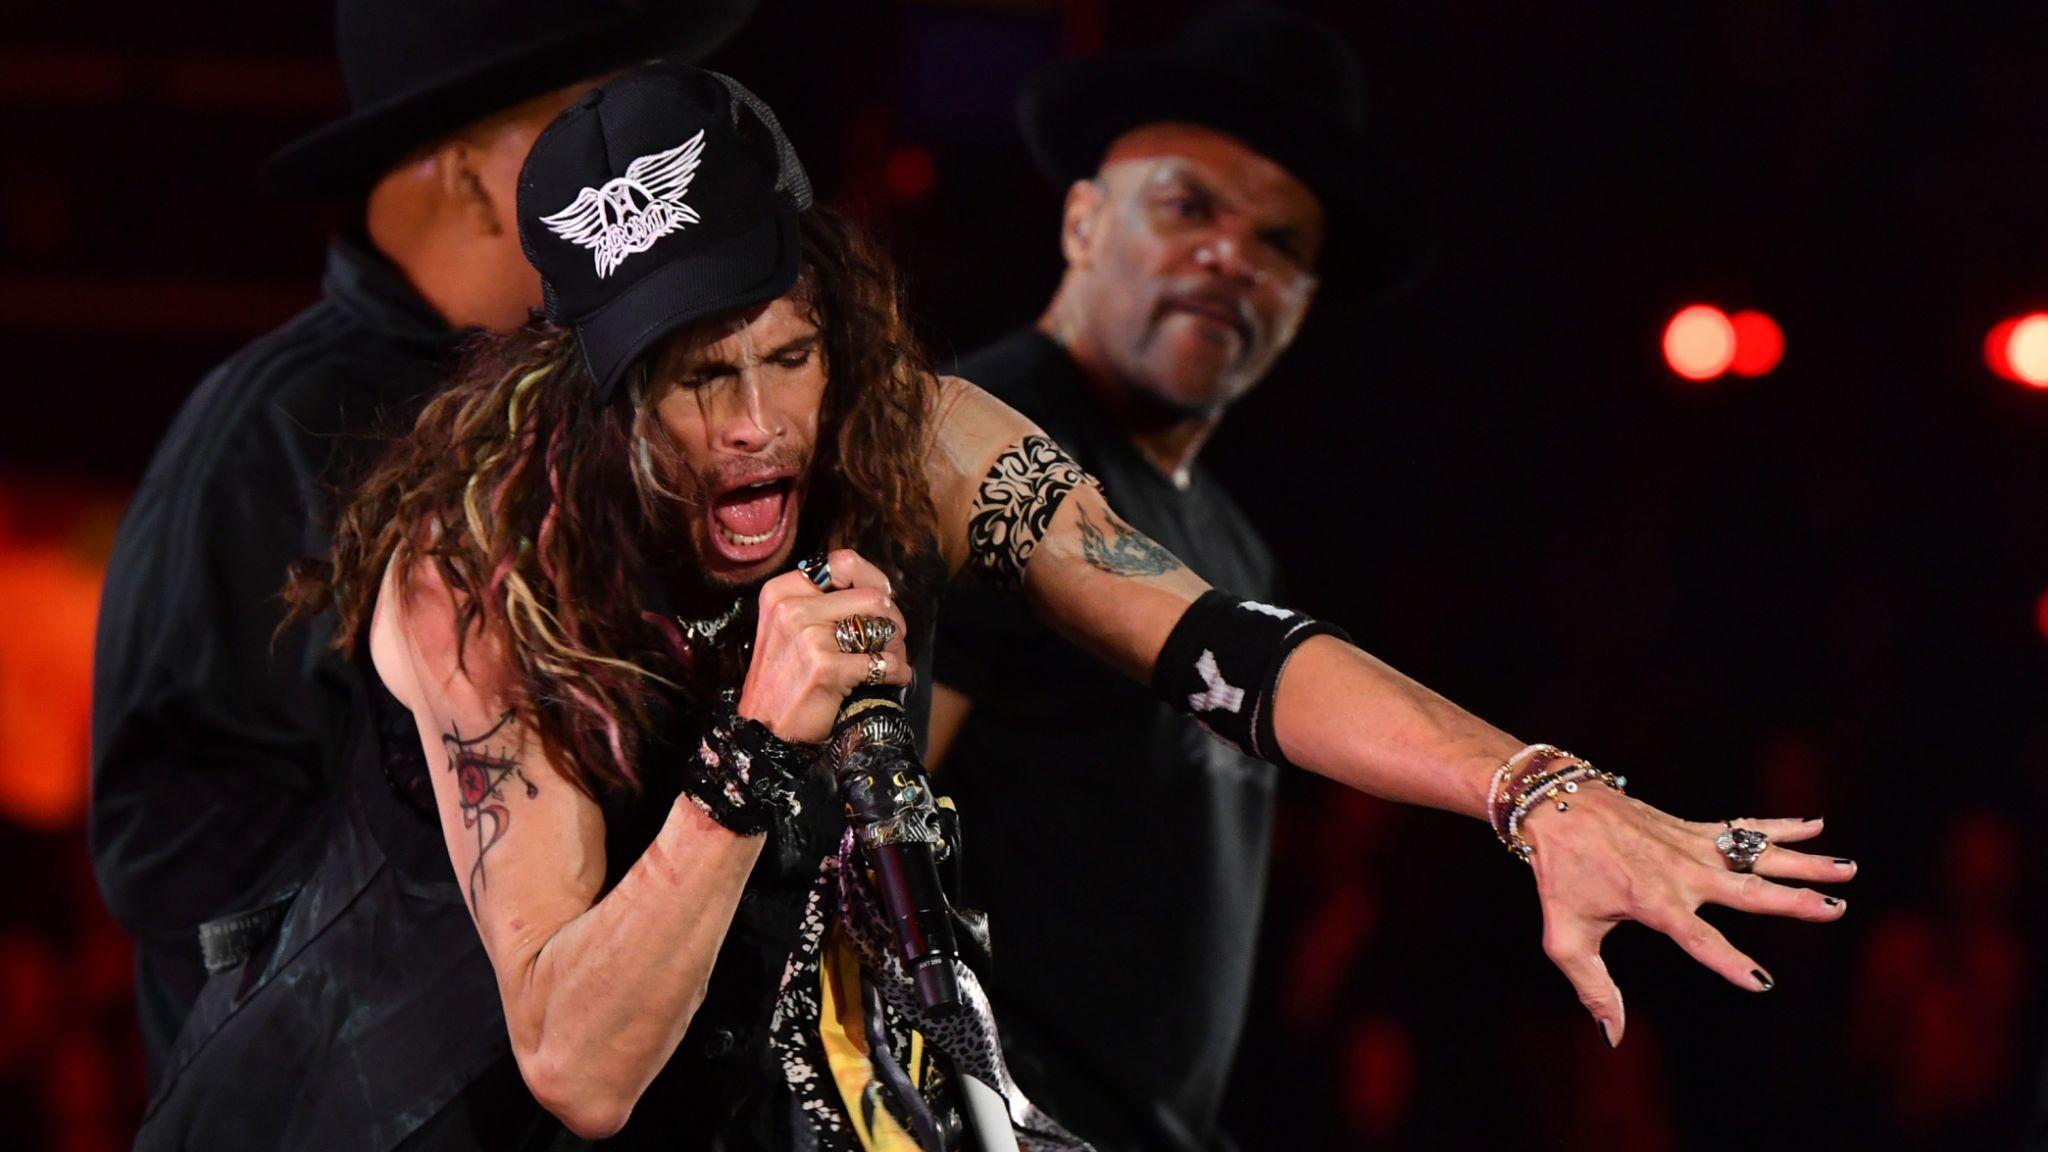 Aerosmith and Run DMC reunited to perform Walk This Way at the Grammys 2020